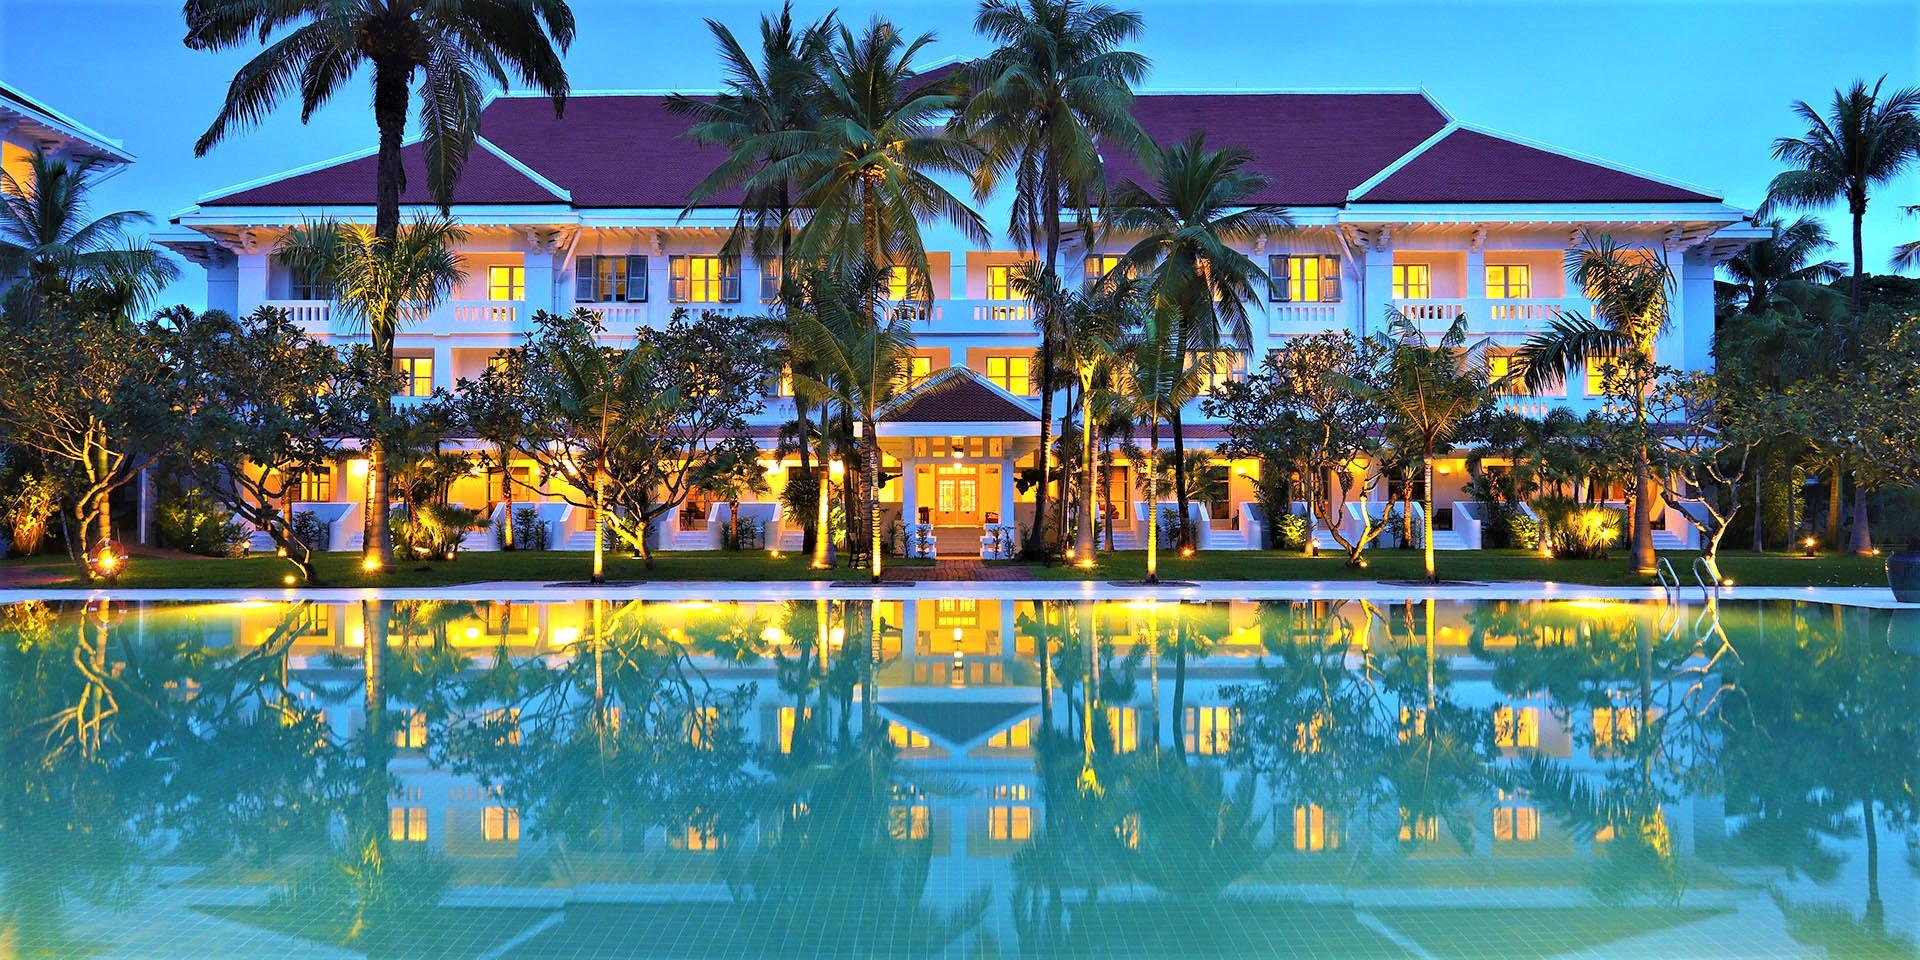 Raffles Udaipur – India's First Ultra-Luxury Raffles Hotel in Udaipur 2020